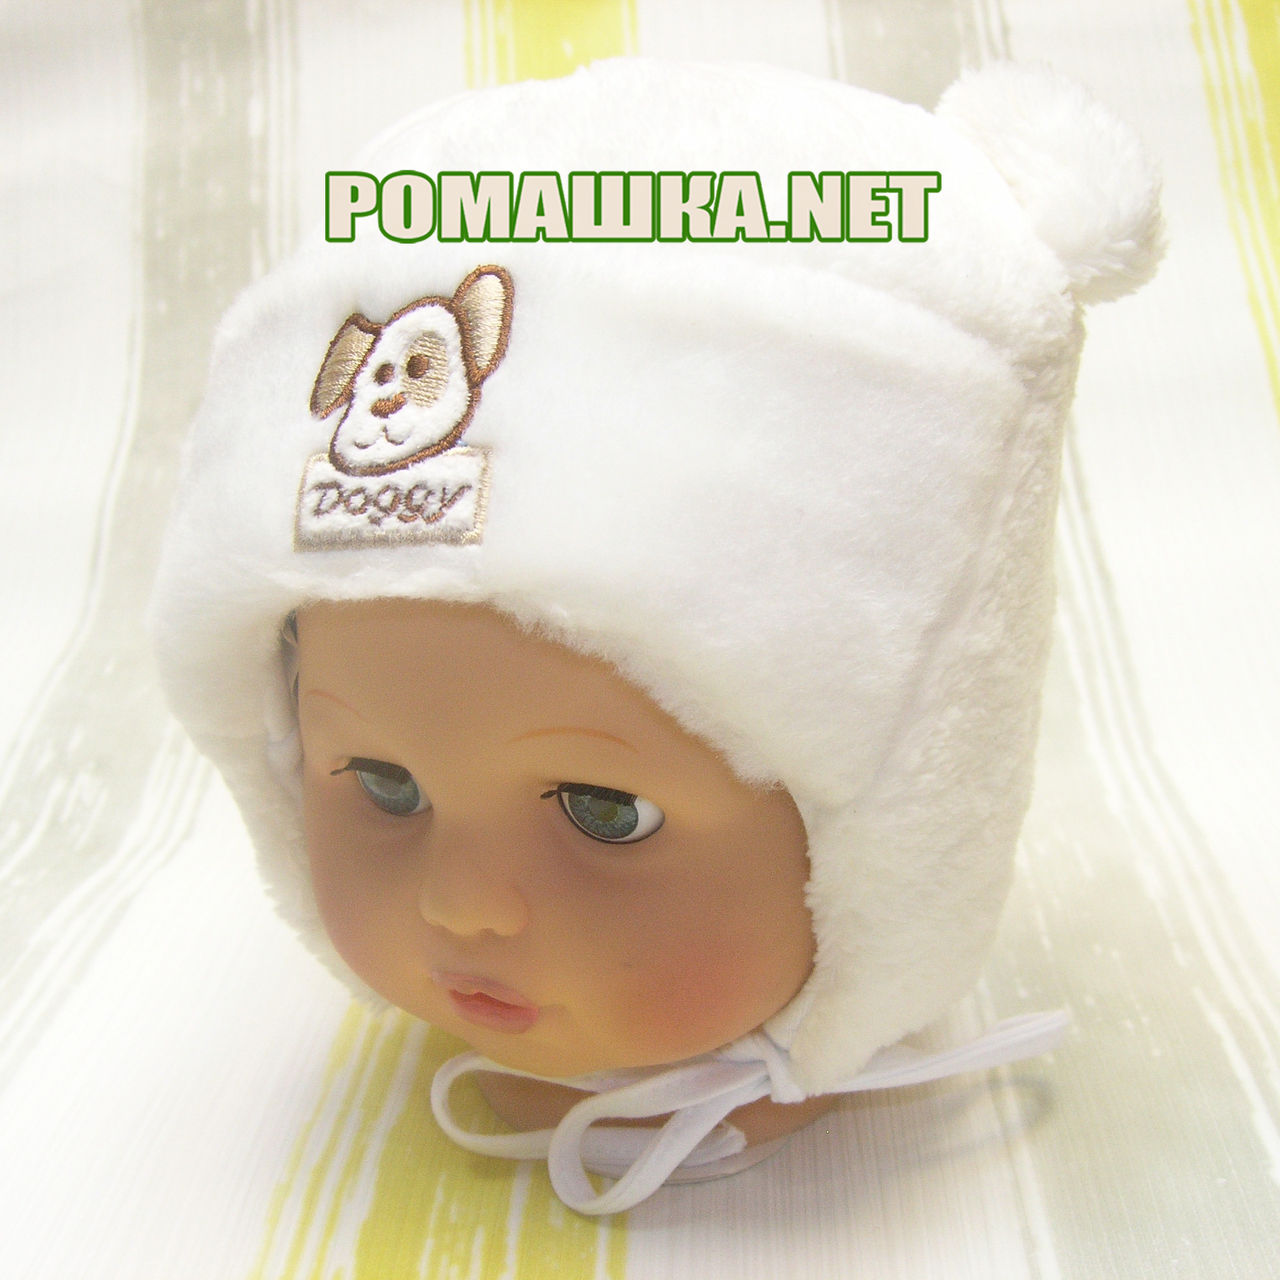 Детская зимняя термо шапочка на завязках р. 42 для новорожденного ТМ Мамина  мода 3206 Бежевый 9ef0366514abb